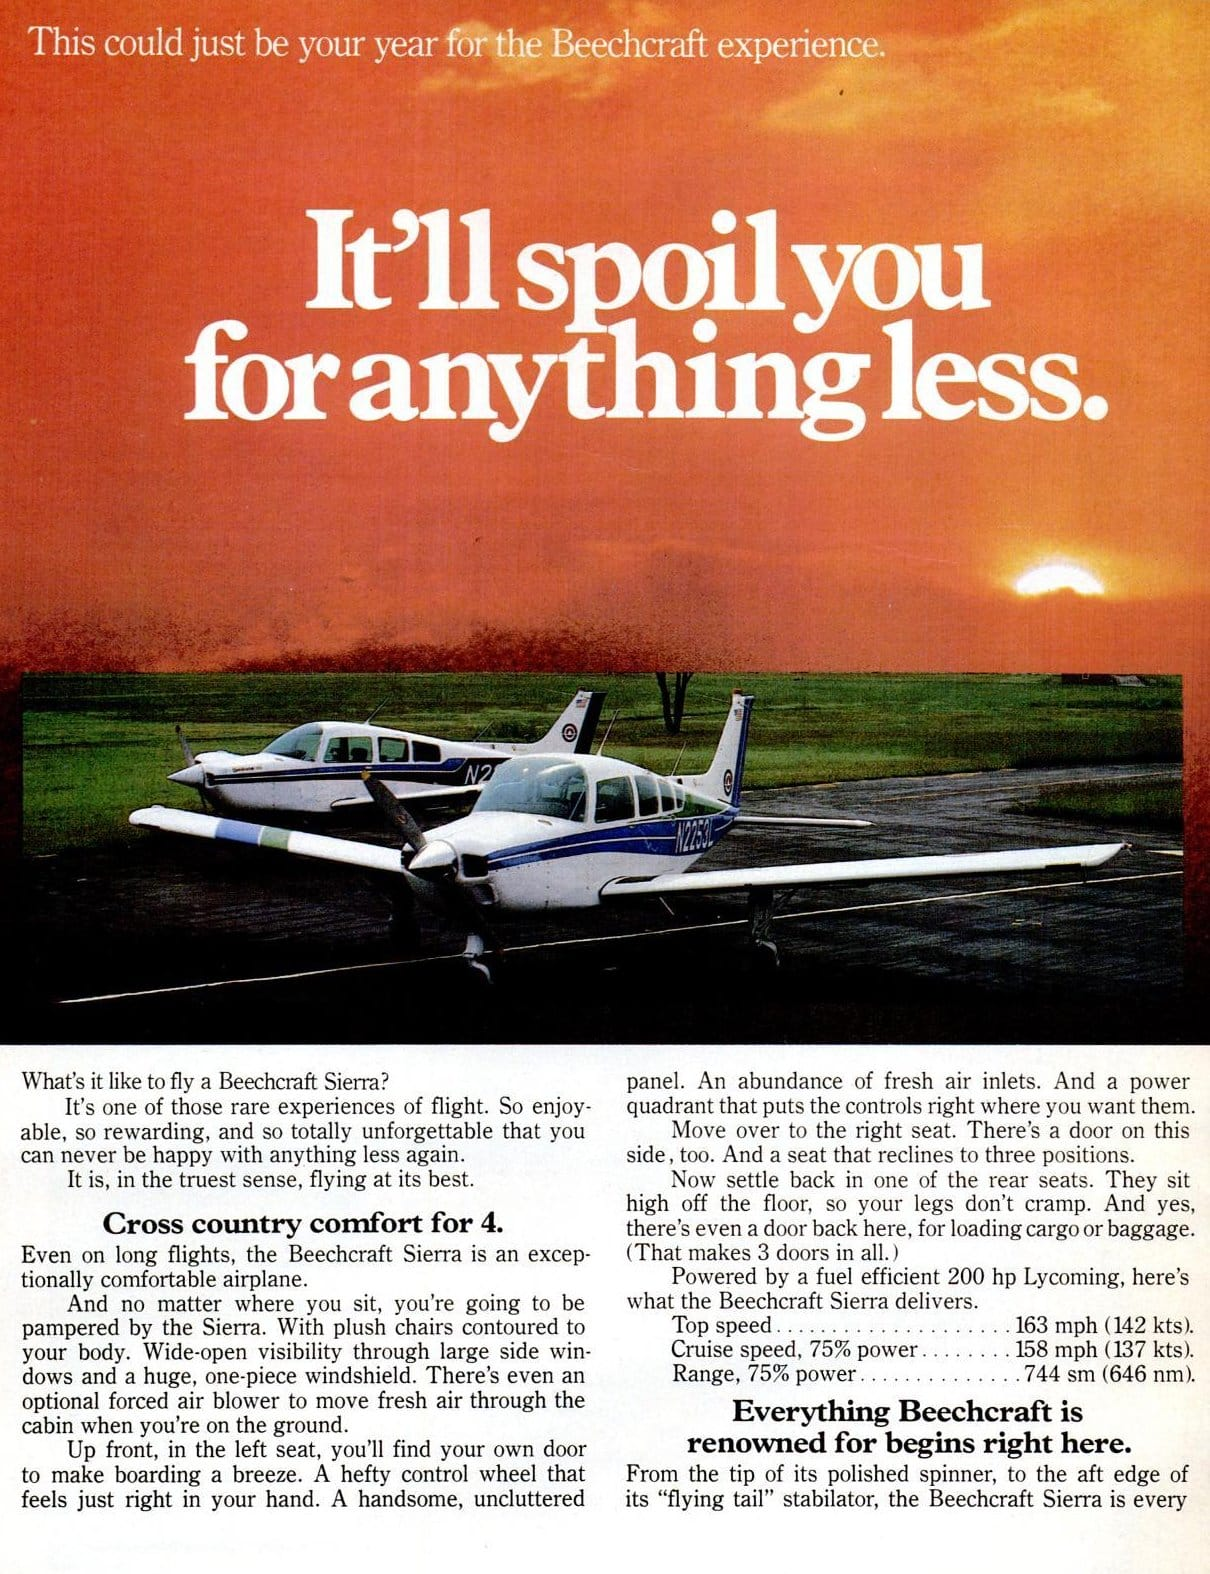 Vintage 1970s Beechcraft Sierra airplanes from 1978 (2)